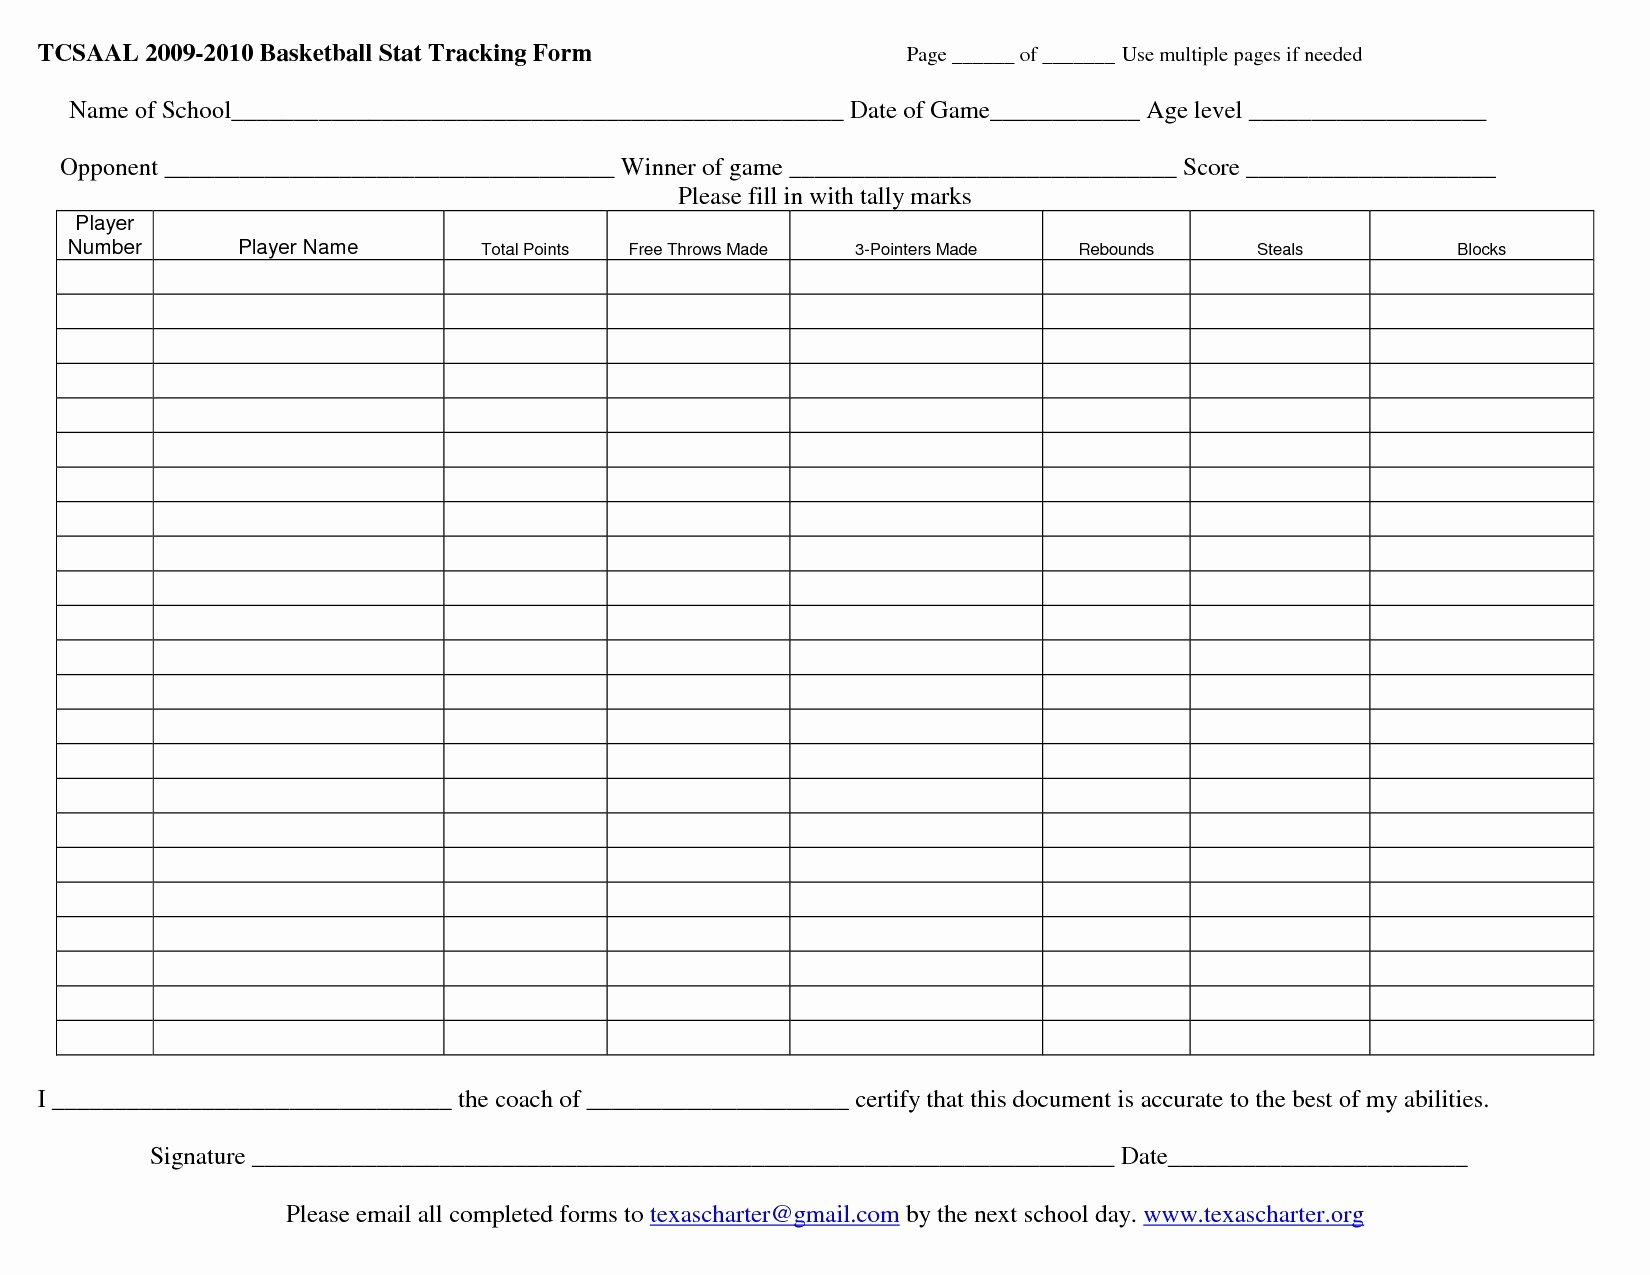 Football Statistics Excel Spreadsheet Pertaining To